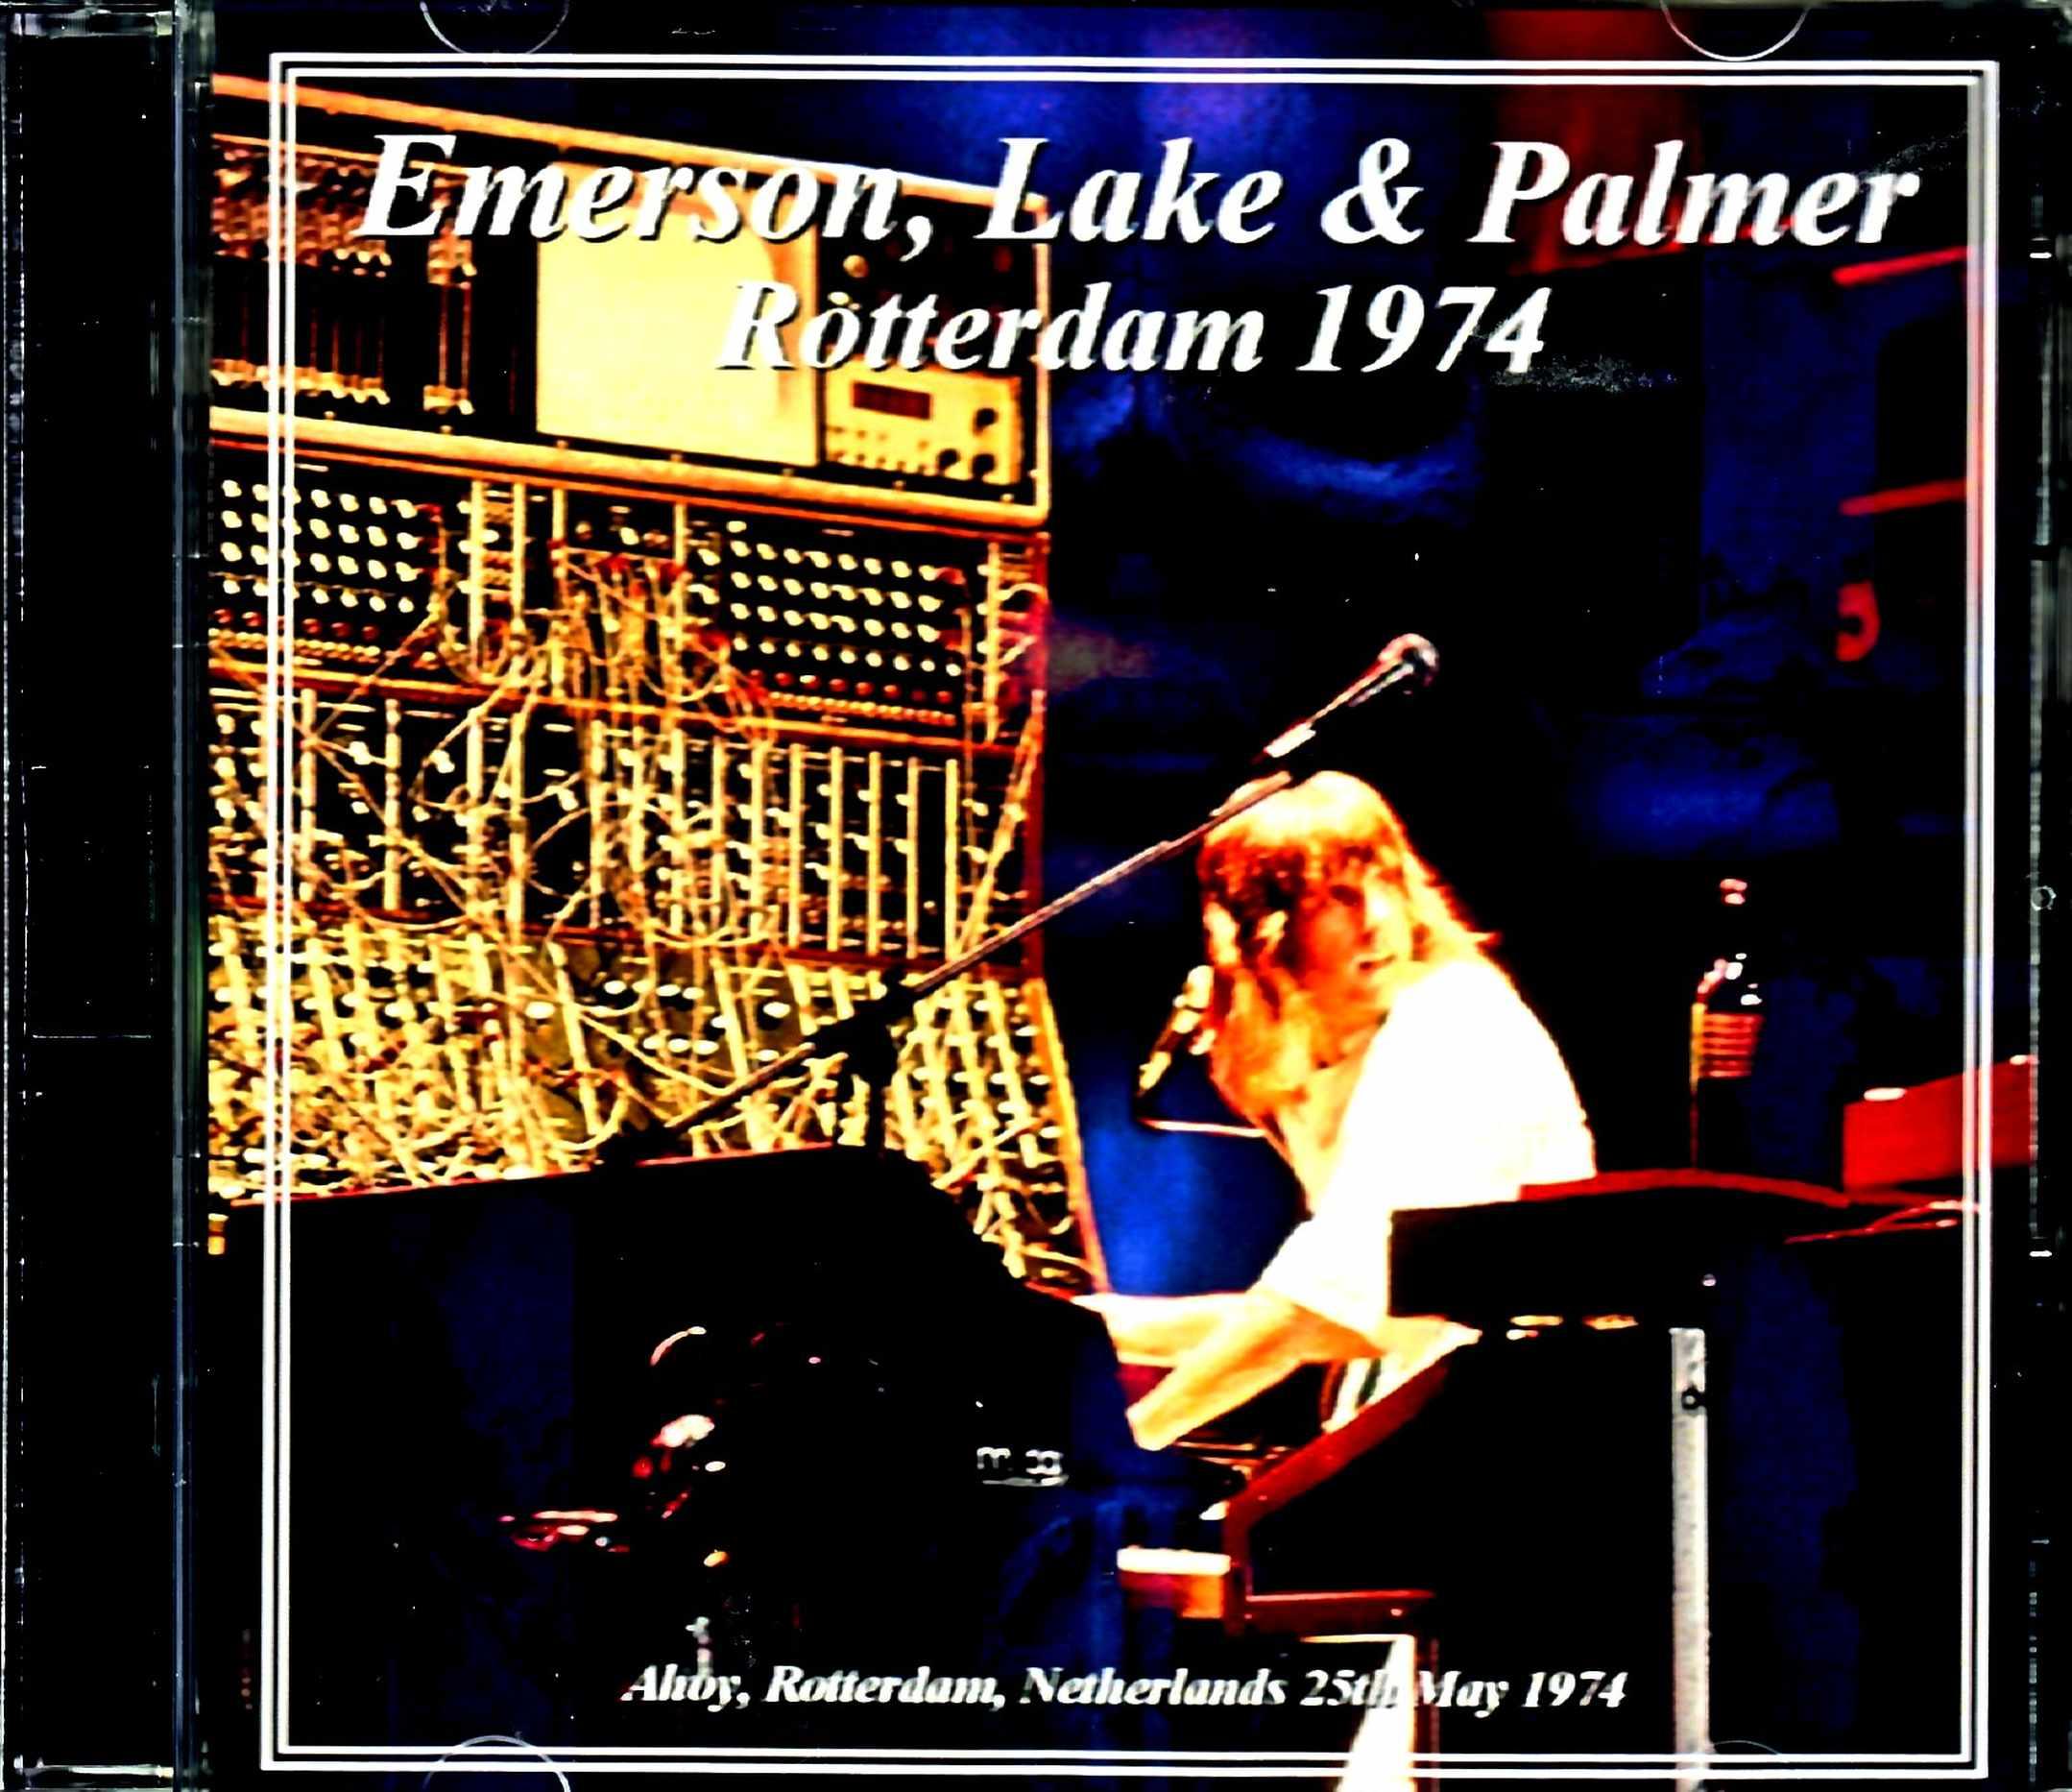 EL & P Emerson,Lake & Palmer エマーソン・レイク・アンド・パーマー/Netherlands 1974